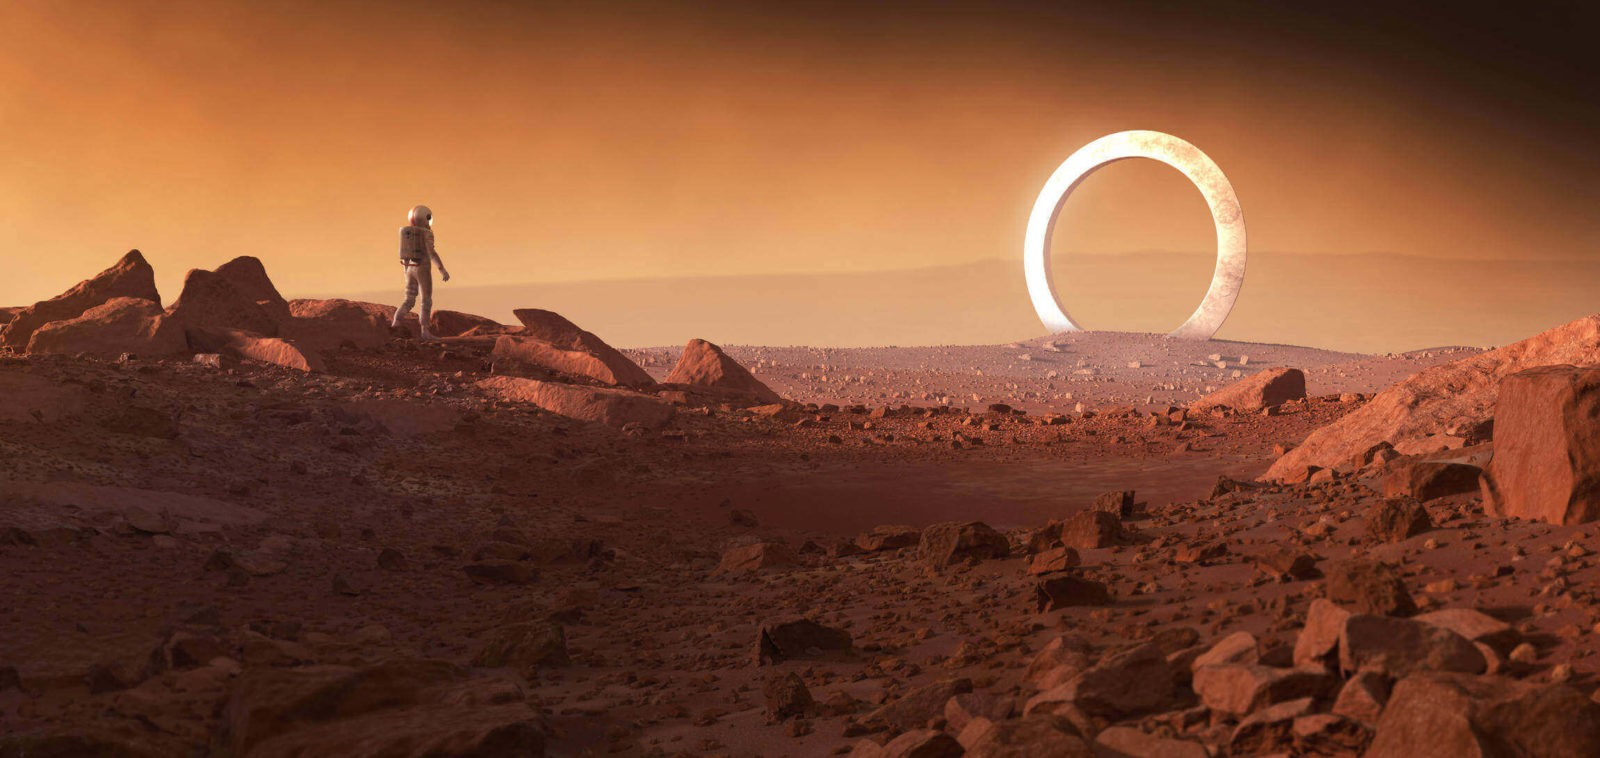 mars landscape images - HD1920×909